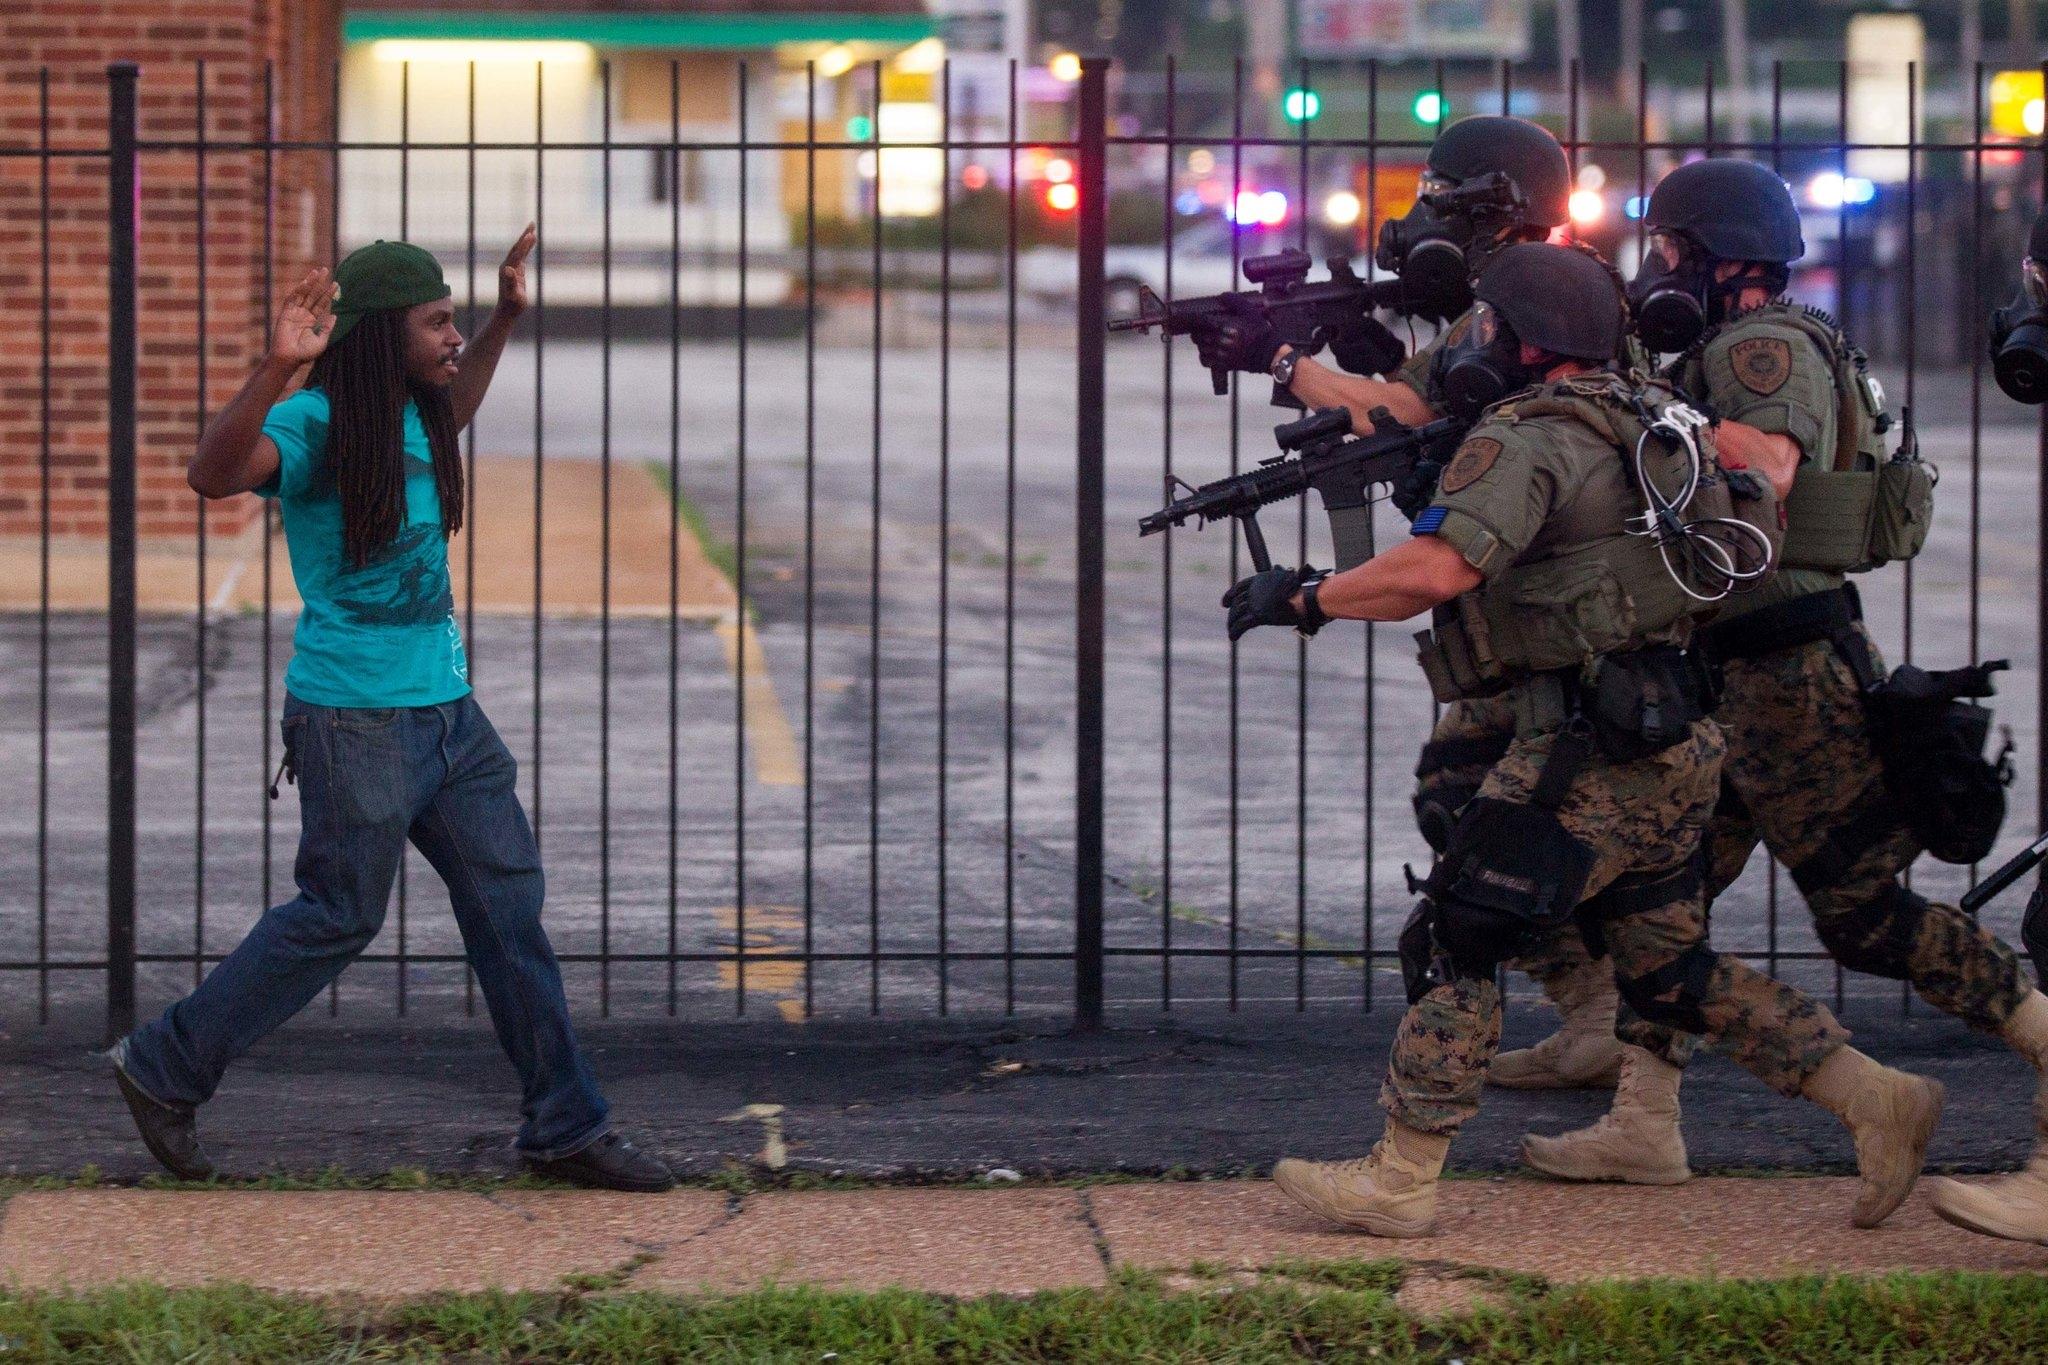 Riot Police Confront a Protestor